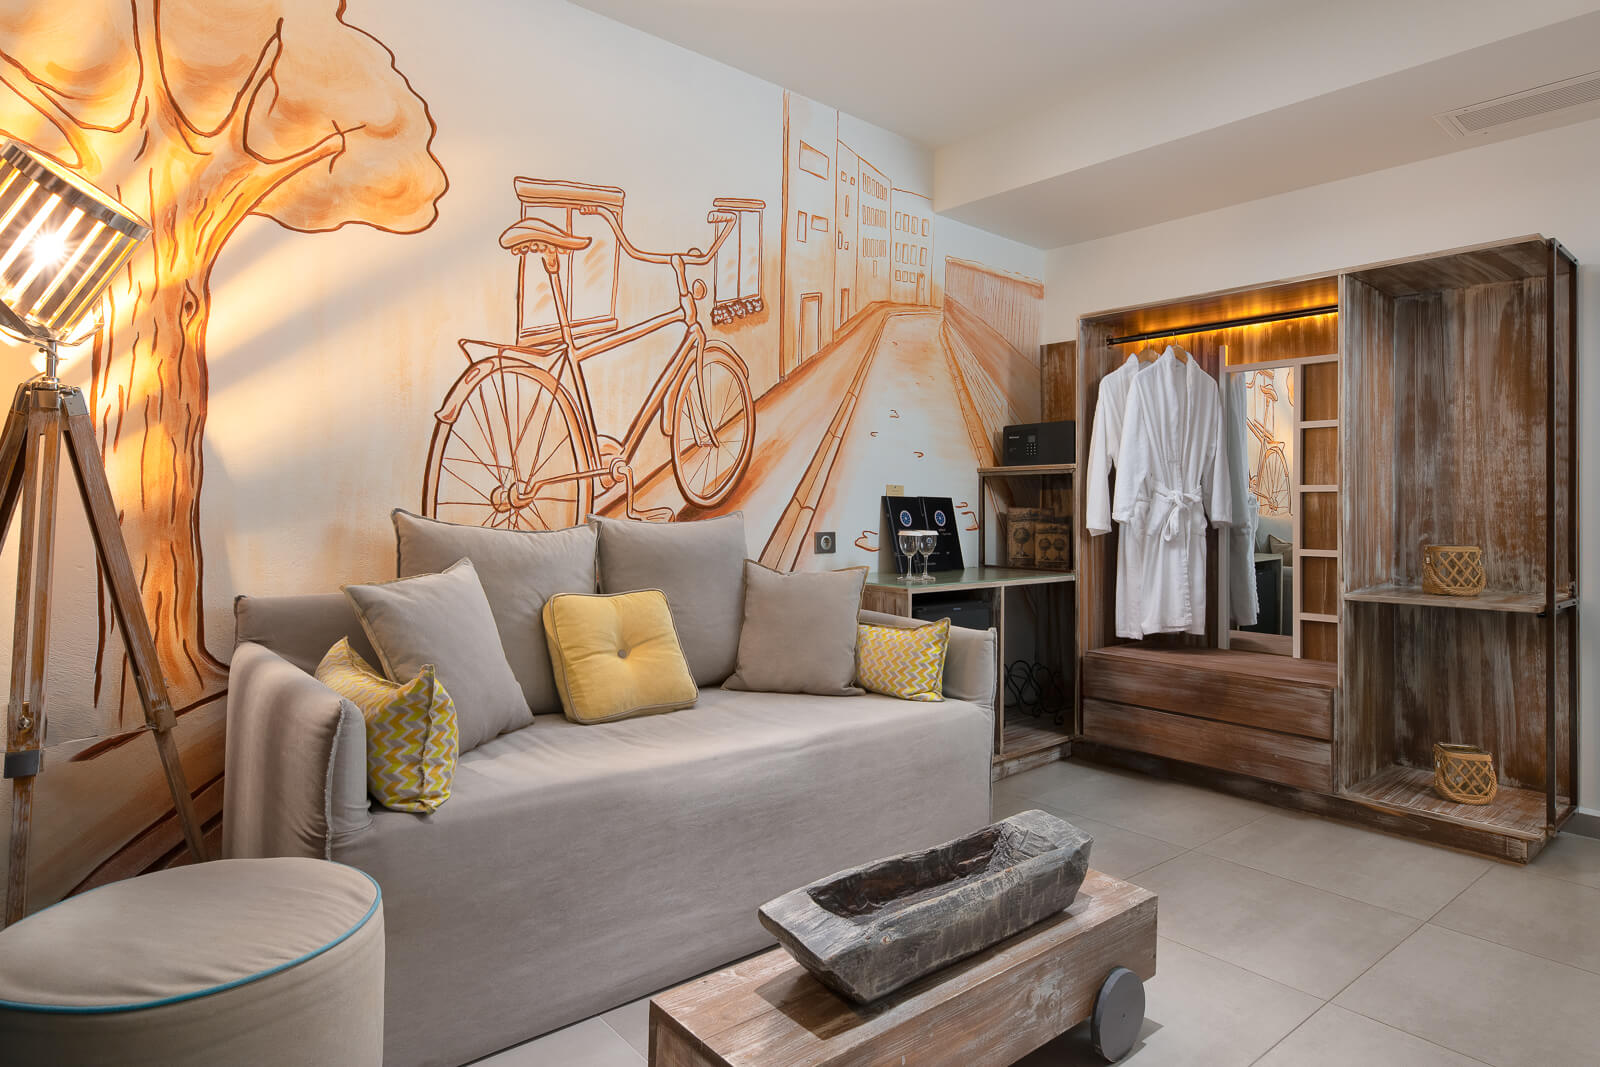 Aspalathos-Living-Room-Elakati-Luxury-Boutique-Hotel-in-Rhodes